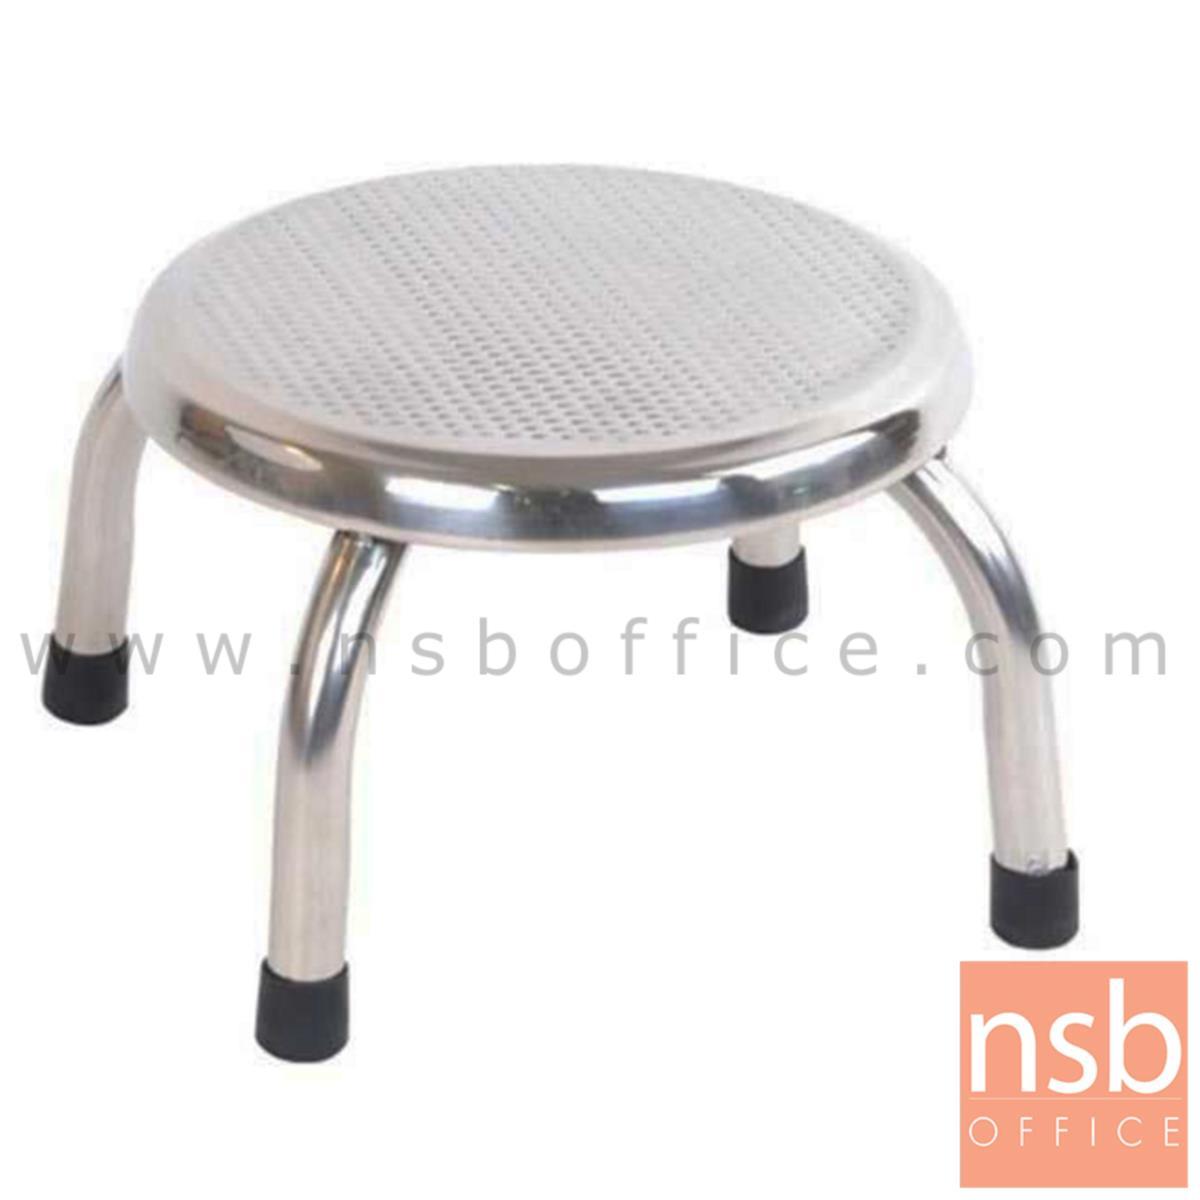 G12A072:เก้าอี้สตูลกลมที่นั่งสเตนเลสเตี้ย รุ่น Salva (ซัลวา) 28Di*20H cm. สเตนเลสล้วน